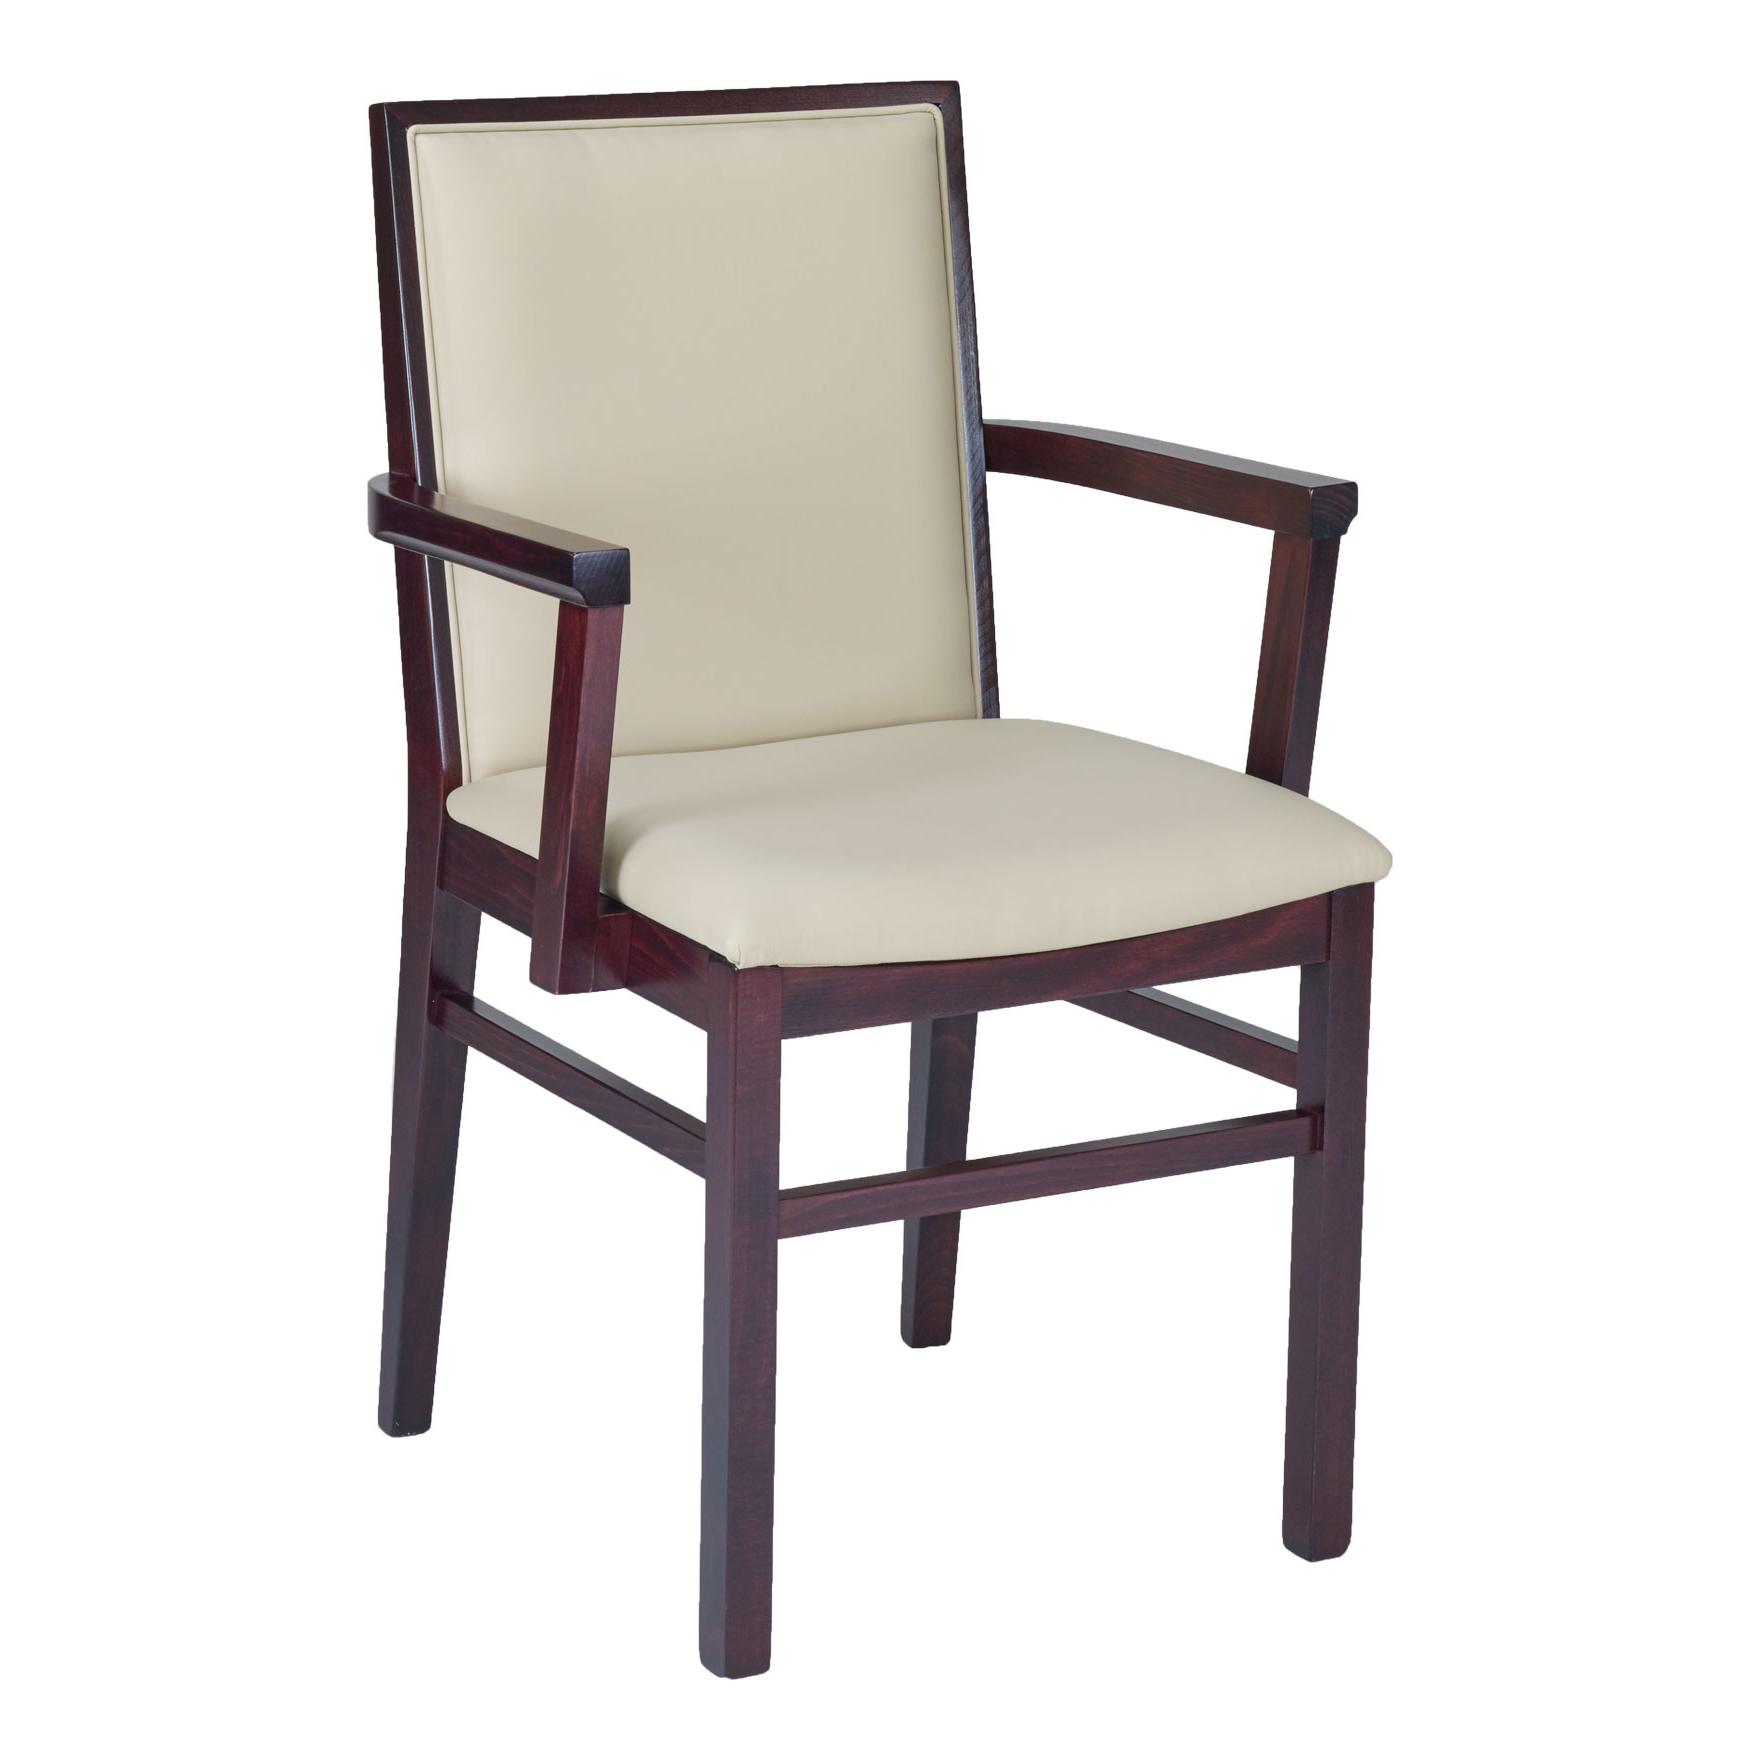 Florida Seating RV-MONTERO A GR7 chair, armchair, indoor